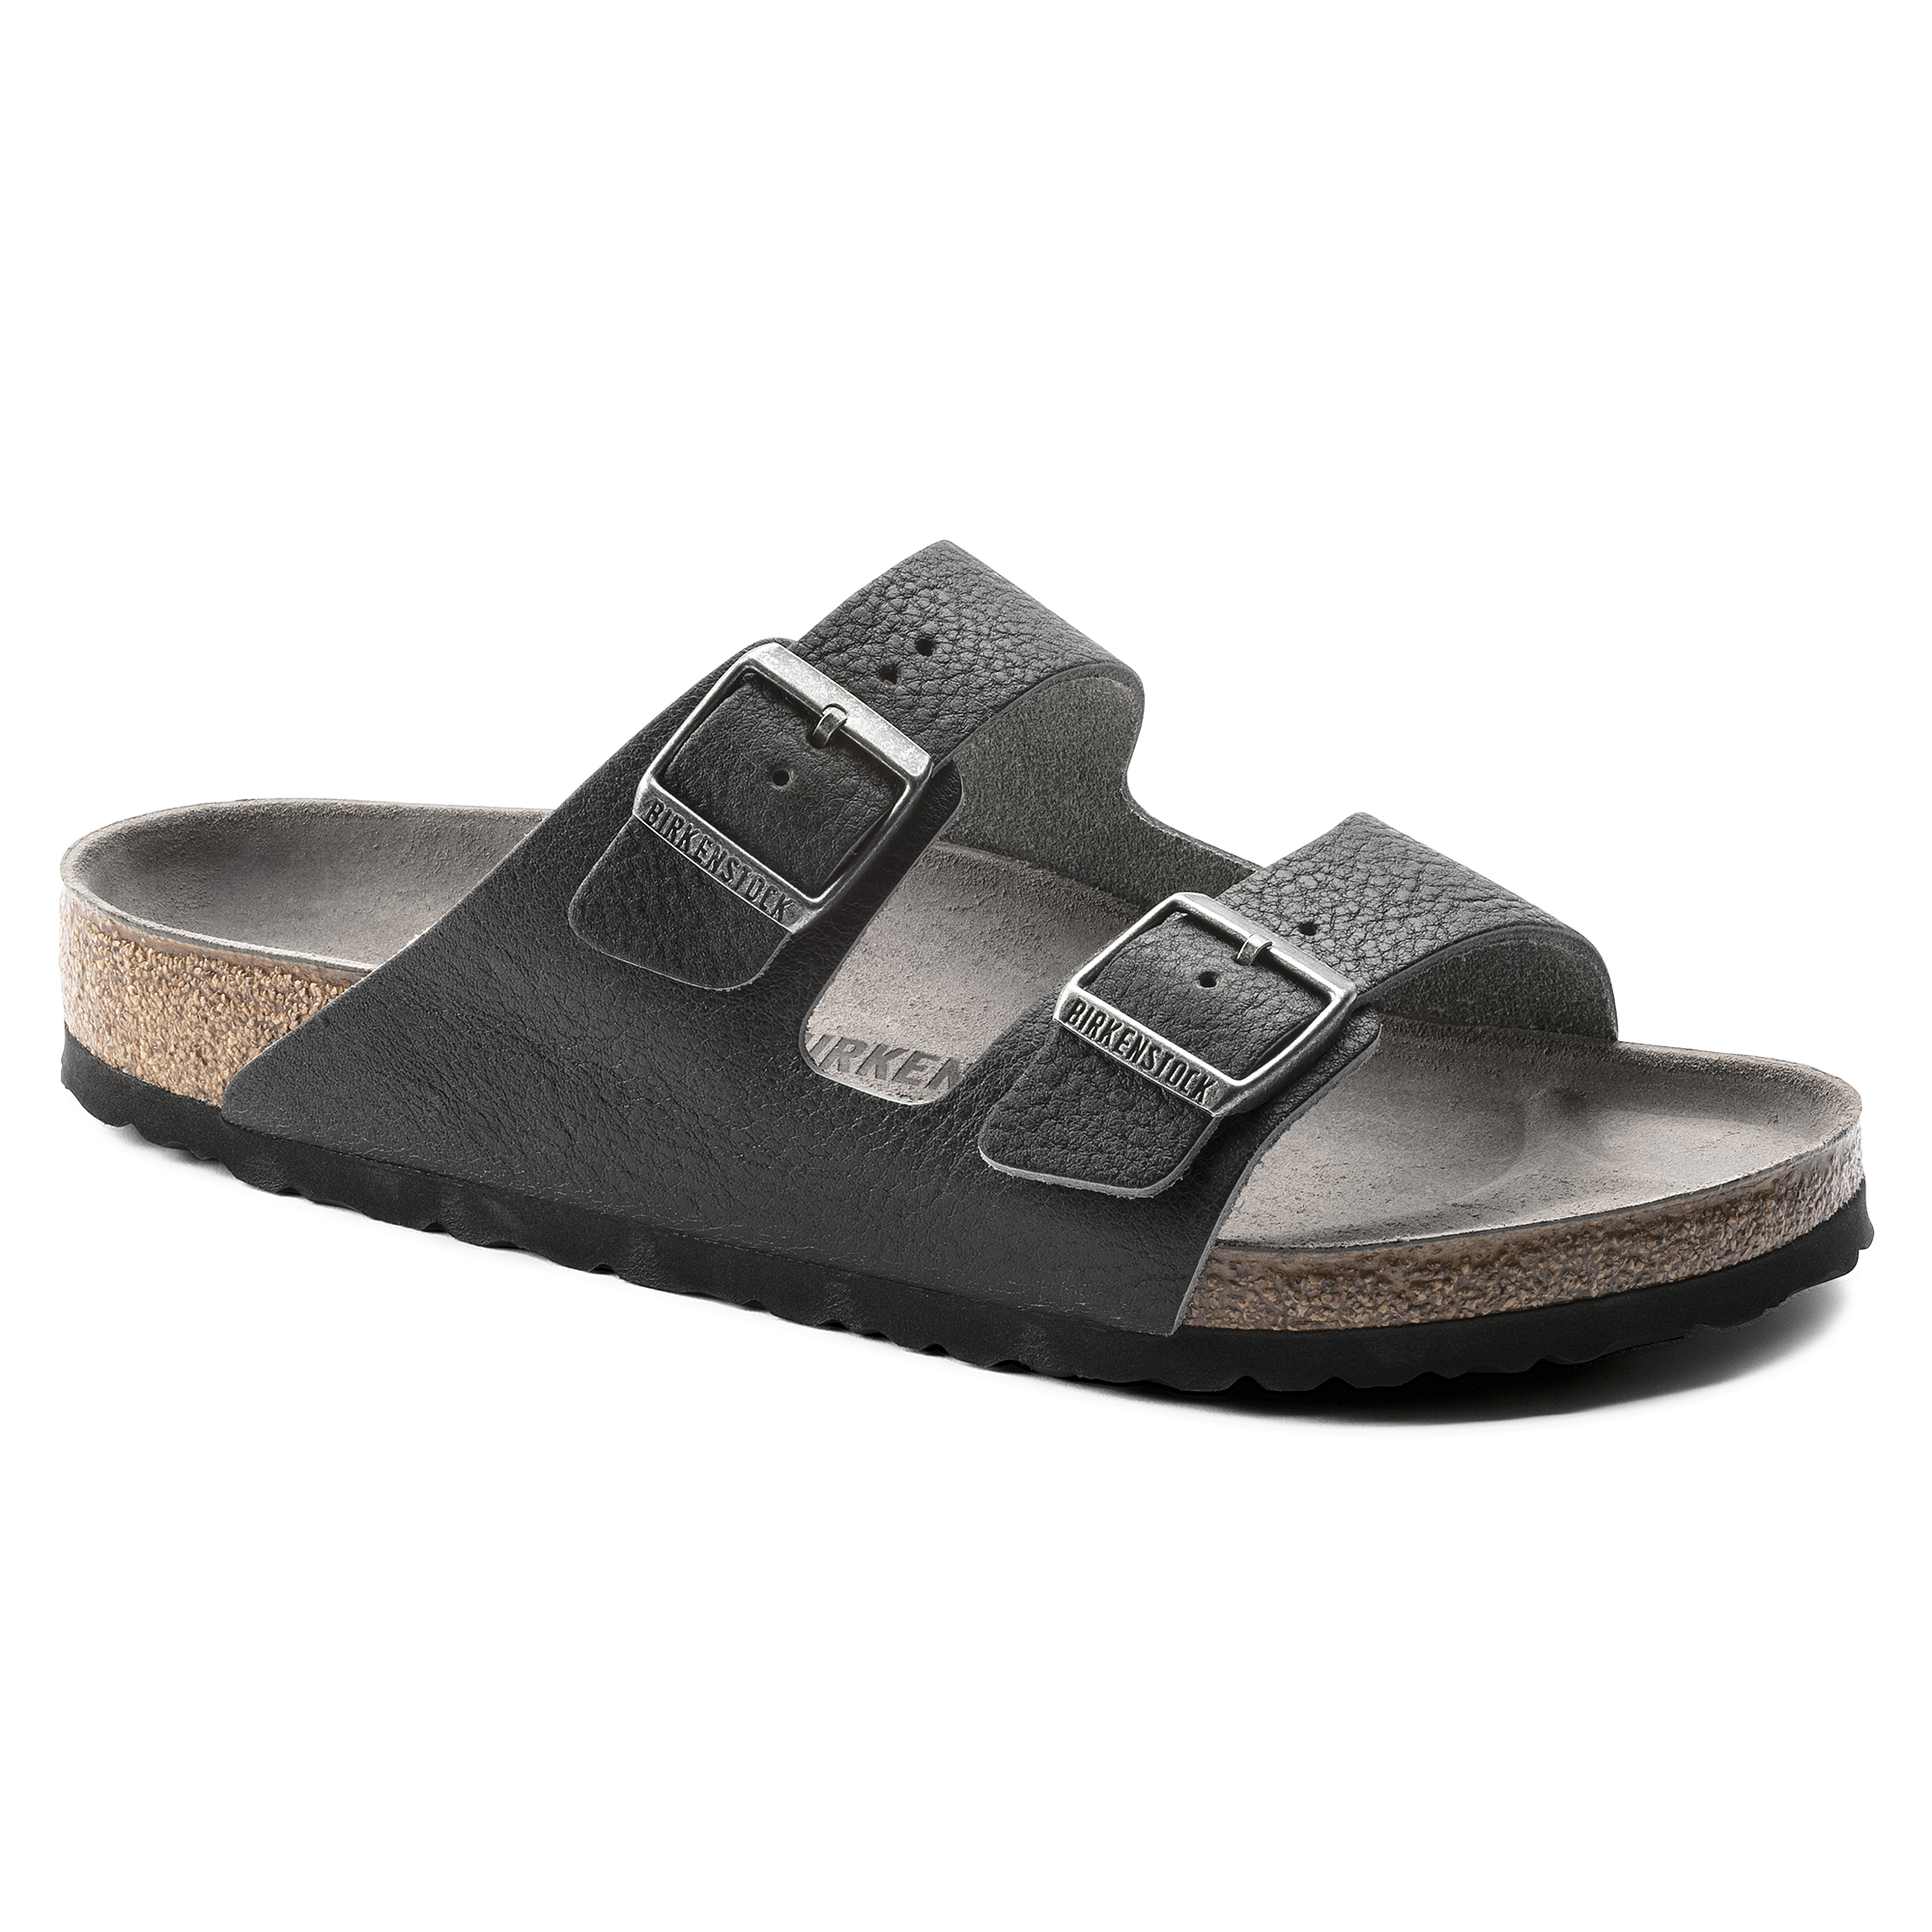 Birkenstock Arizona NL Sandals Vintage Anthracite